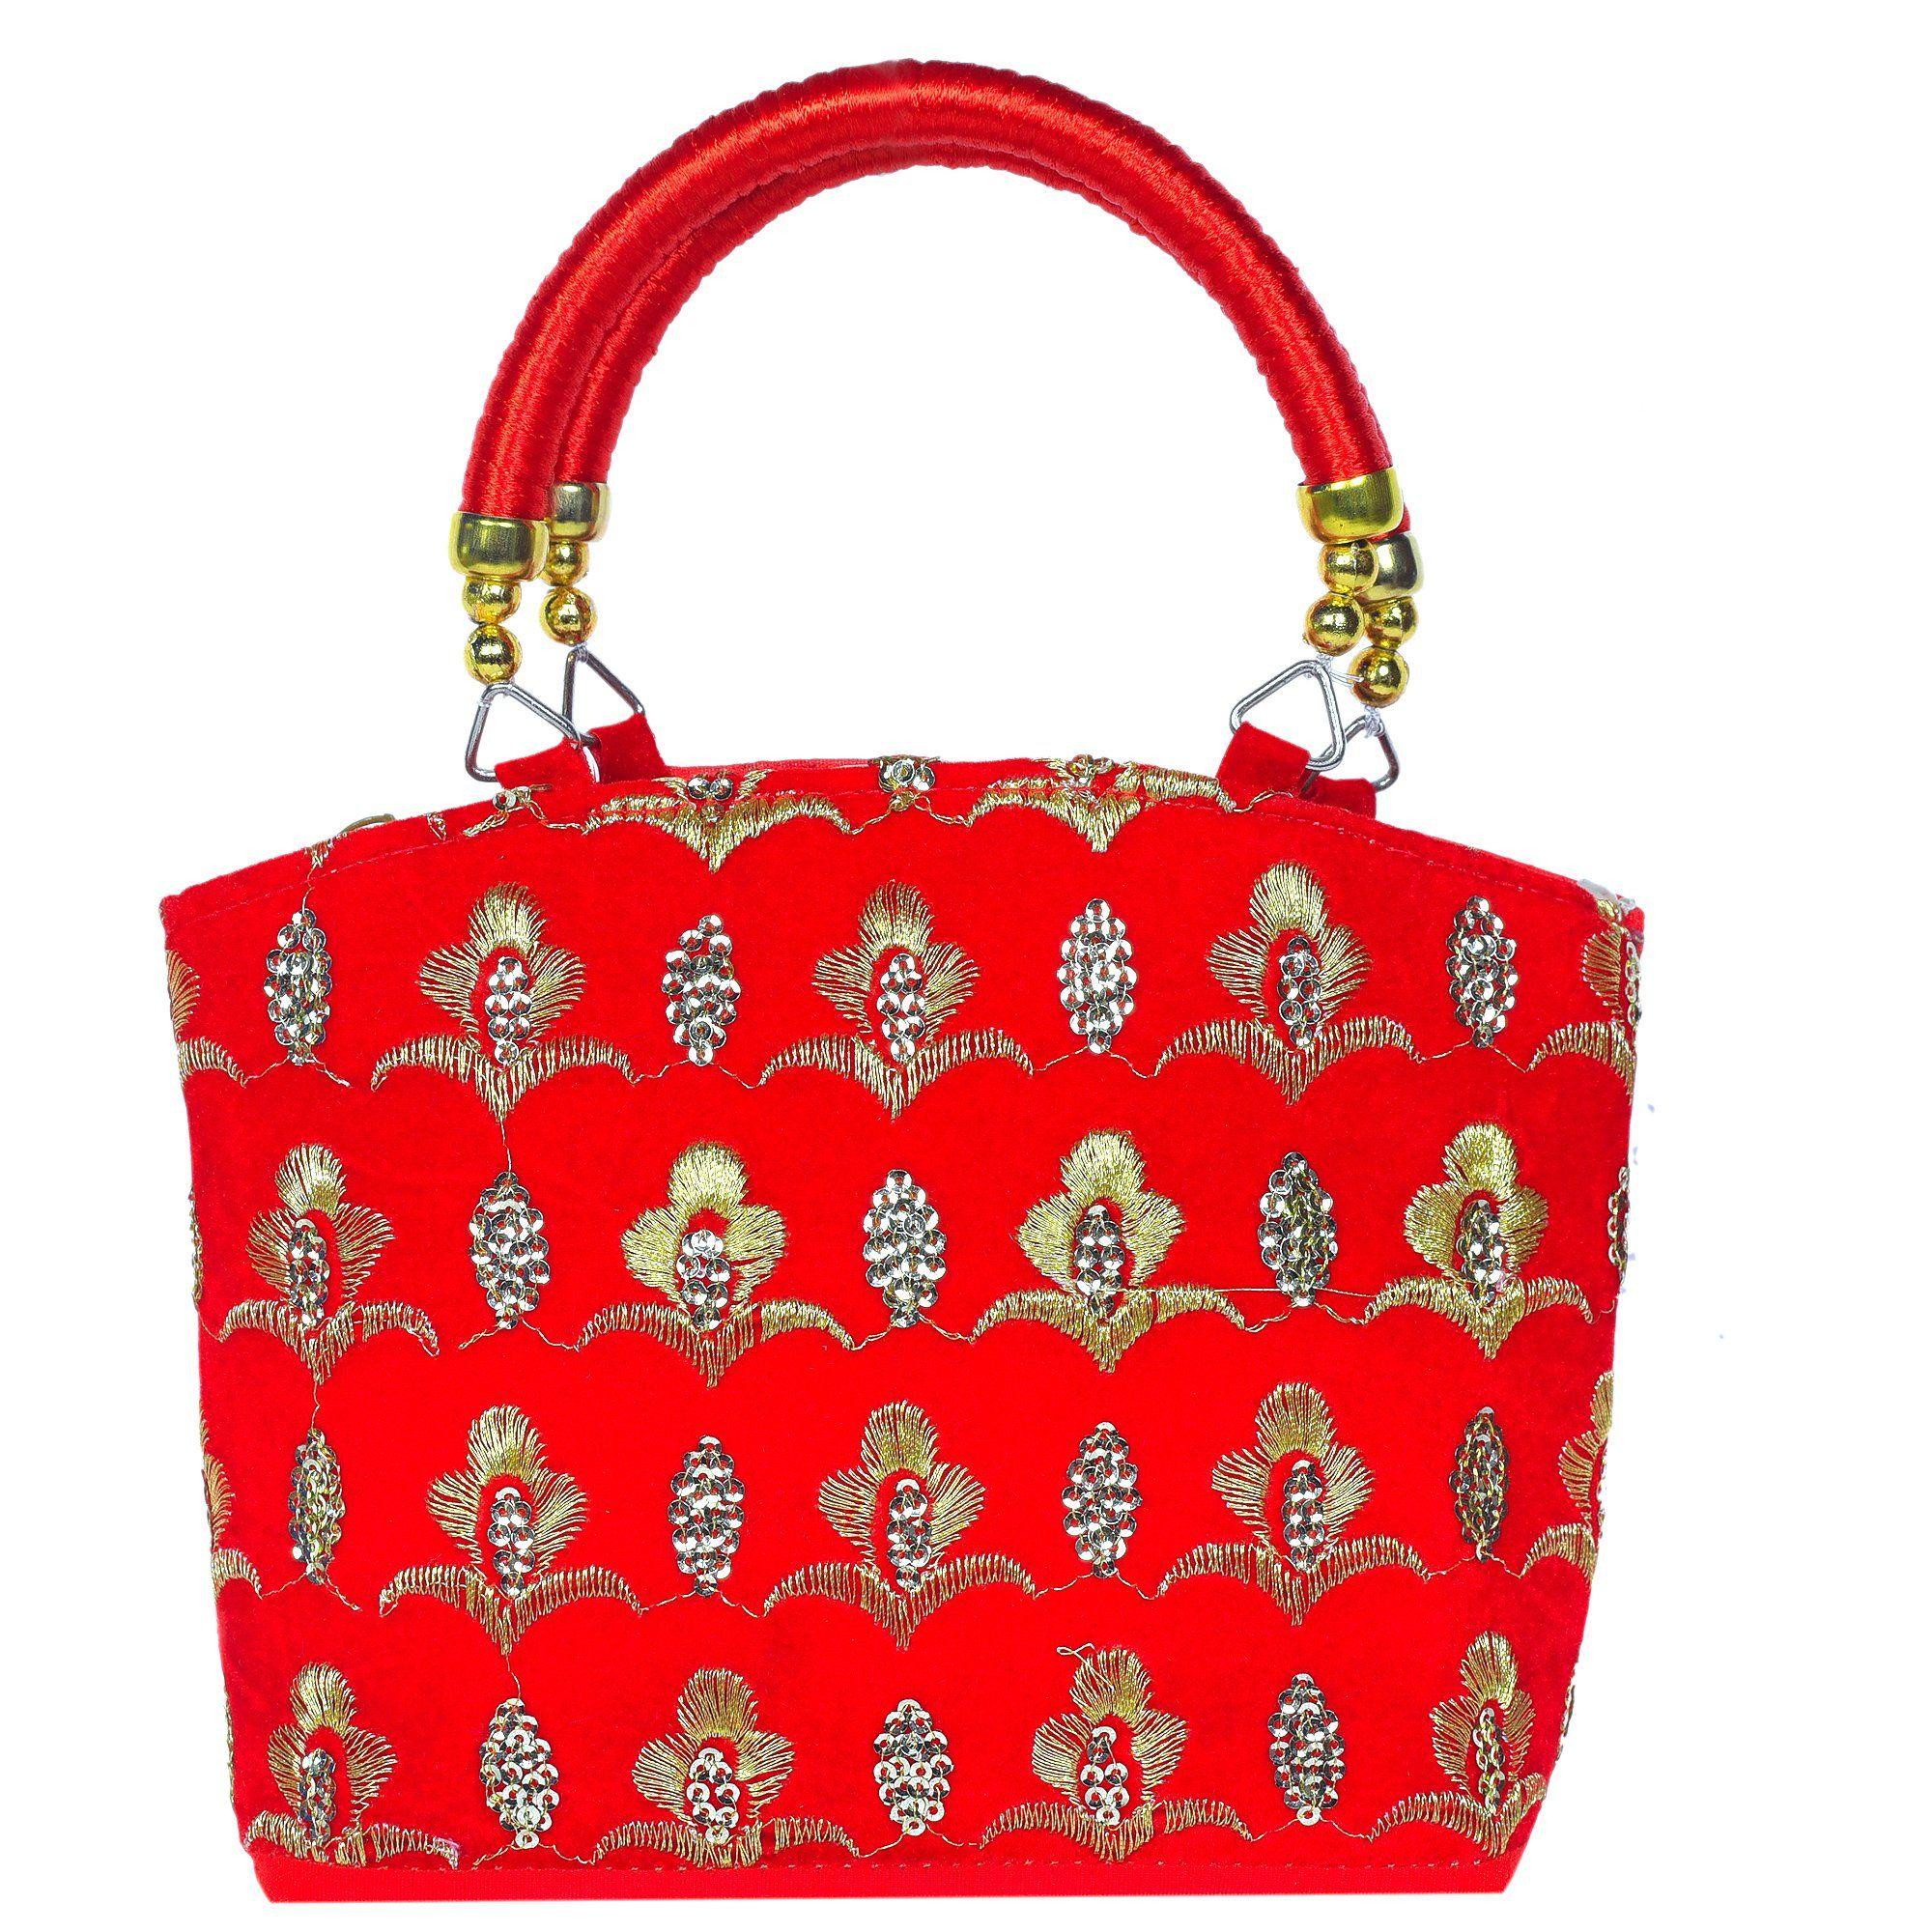 Women's Velvet Traditional Handbag / Attractive Fashion Handbag / Designer Purse / Sequence Work Bridal Handbag / Party Handbag -- Awesome products selected by Anna Churchill